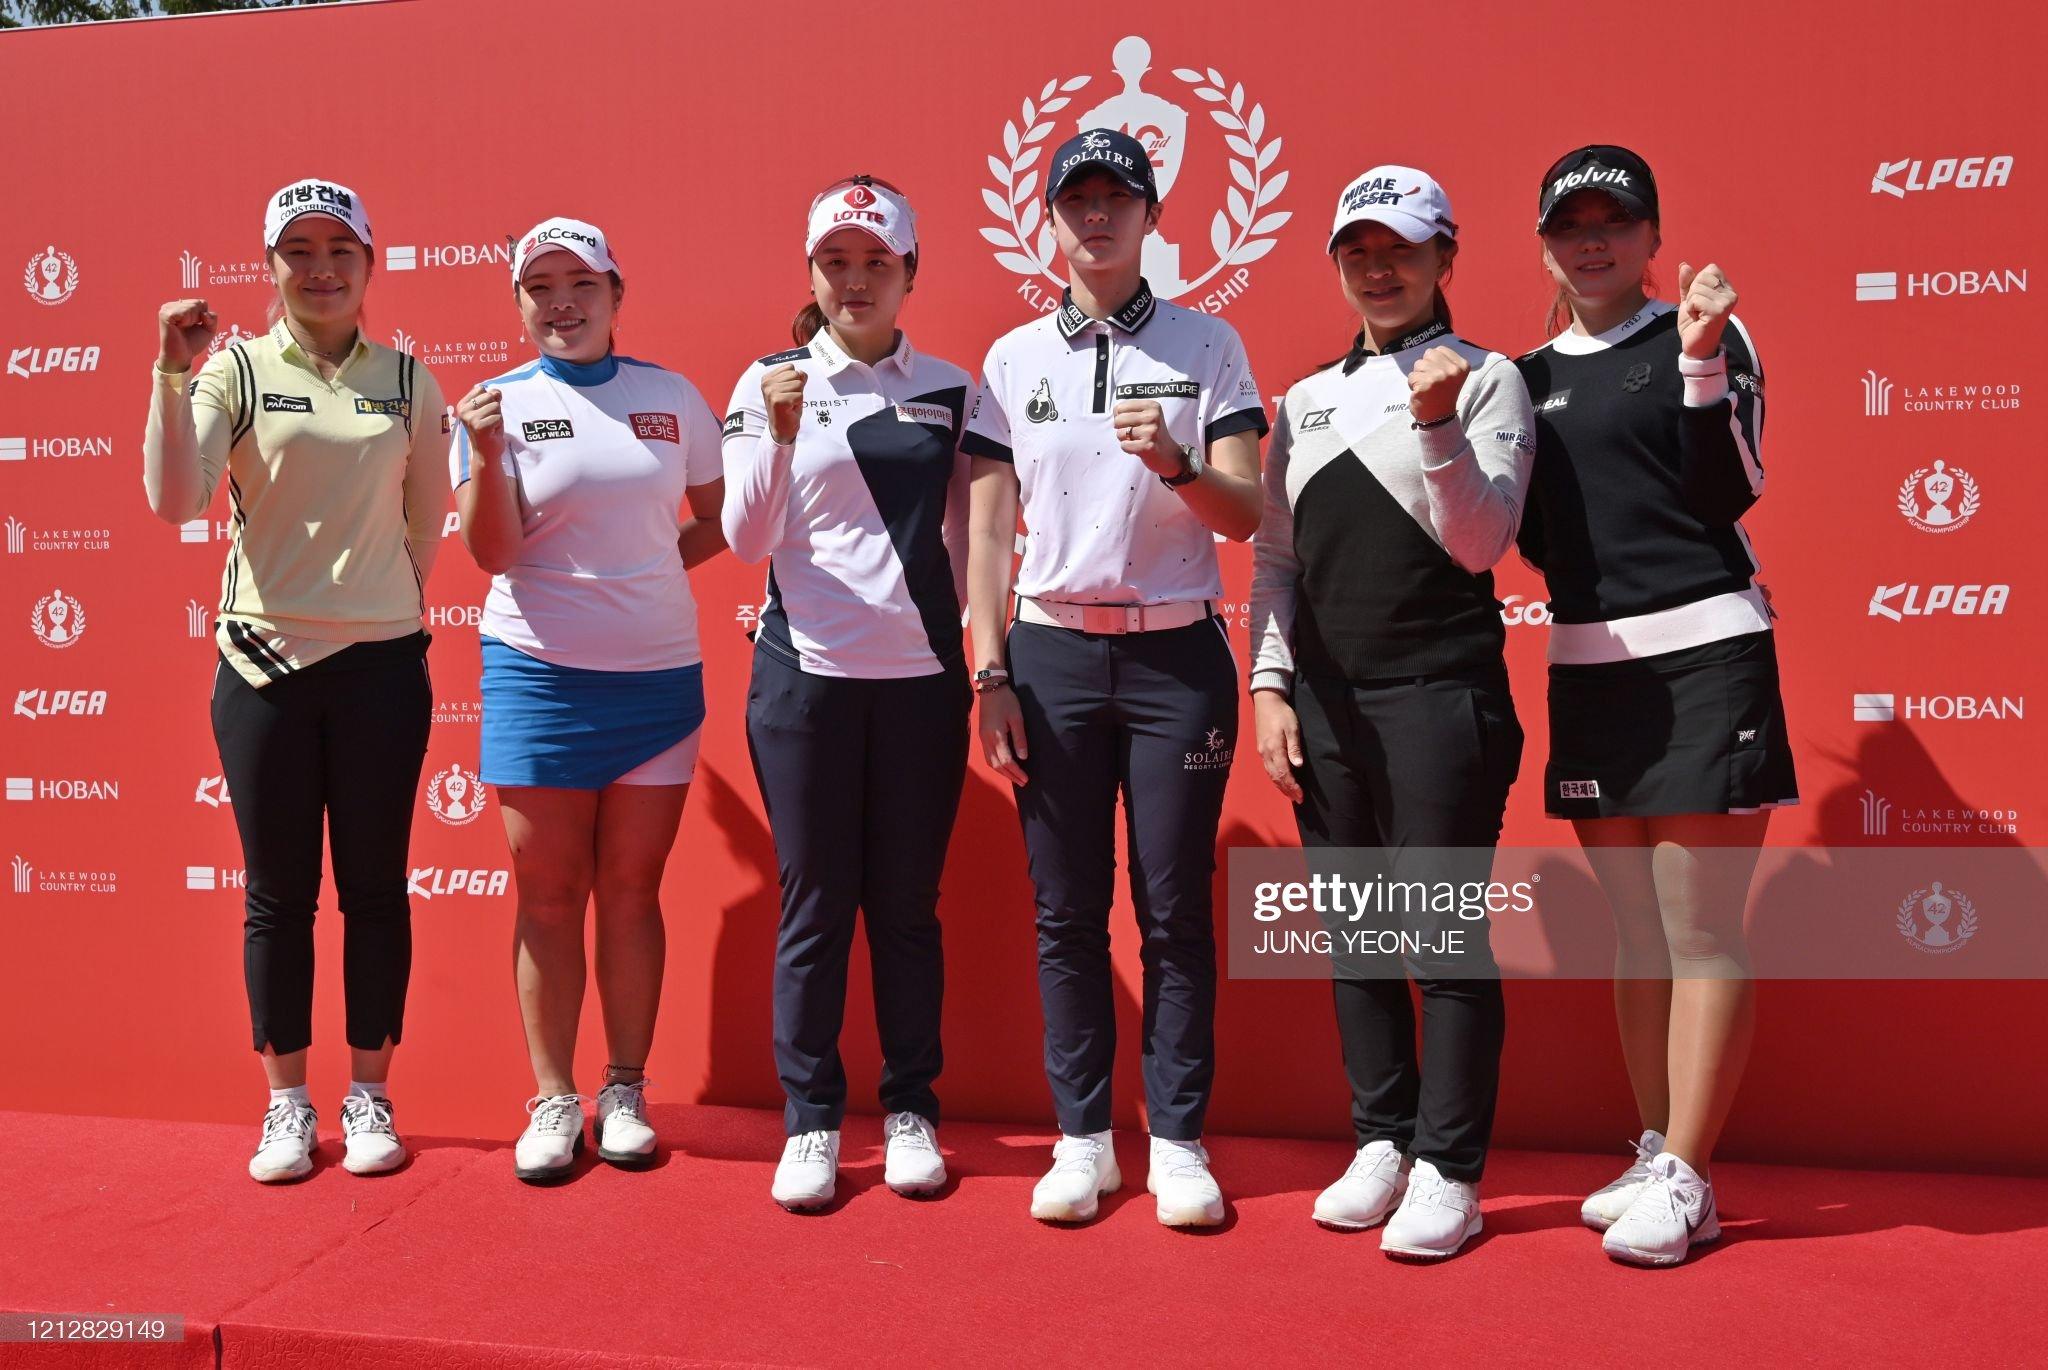 https://media.gettyimages.com/photos/south-korean-golfers-lee-jeongeun-jang-hana-choi-hyejin-park-sunghyun-picture-id1212829149?s=2048x2048